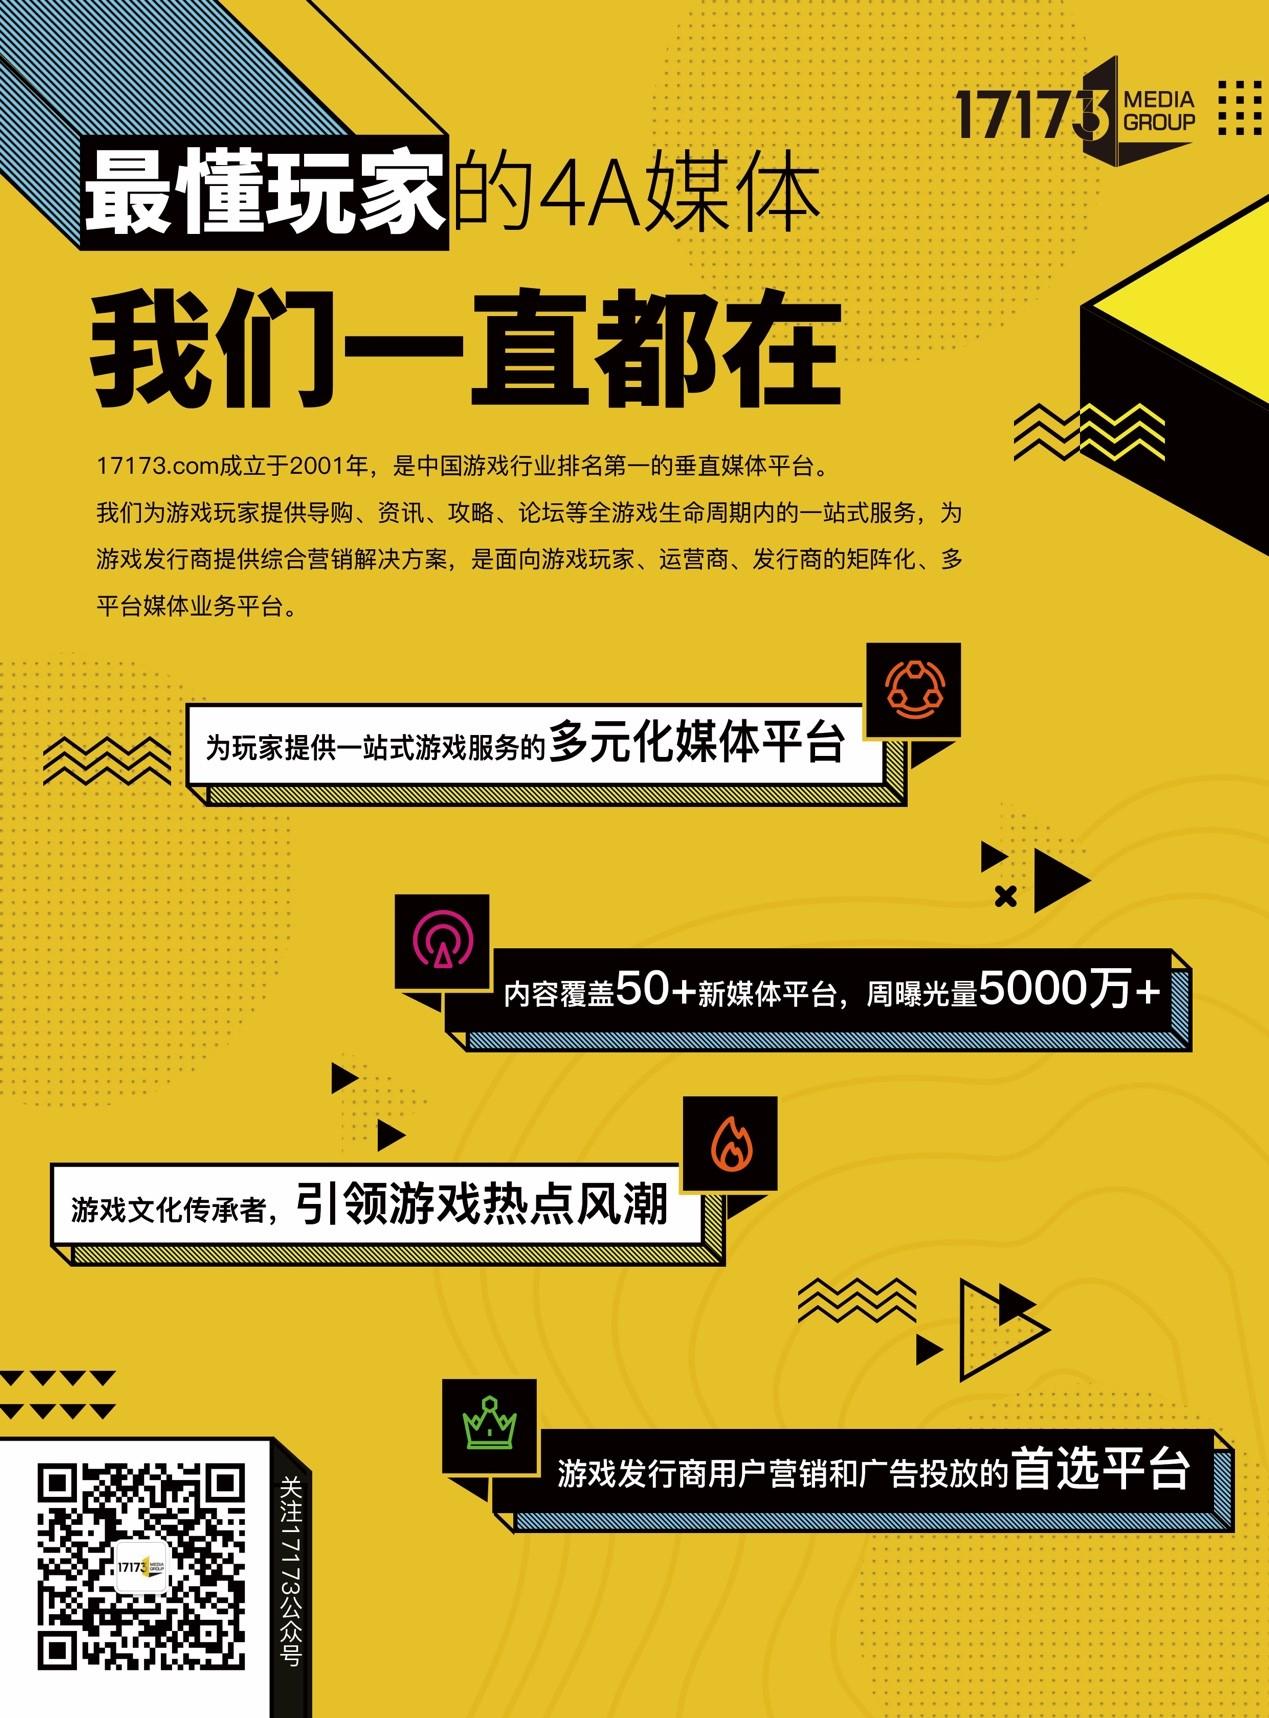 http://www.wgpg.cn/gnxw/153485.html